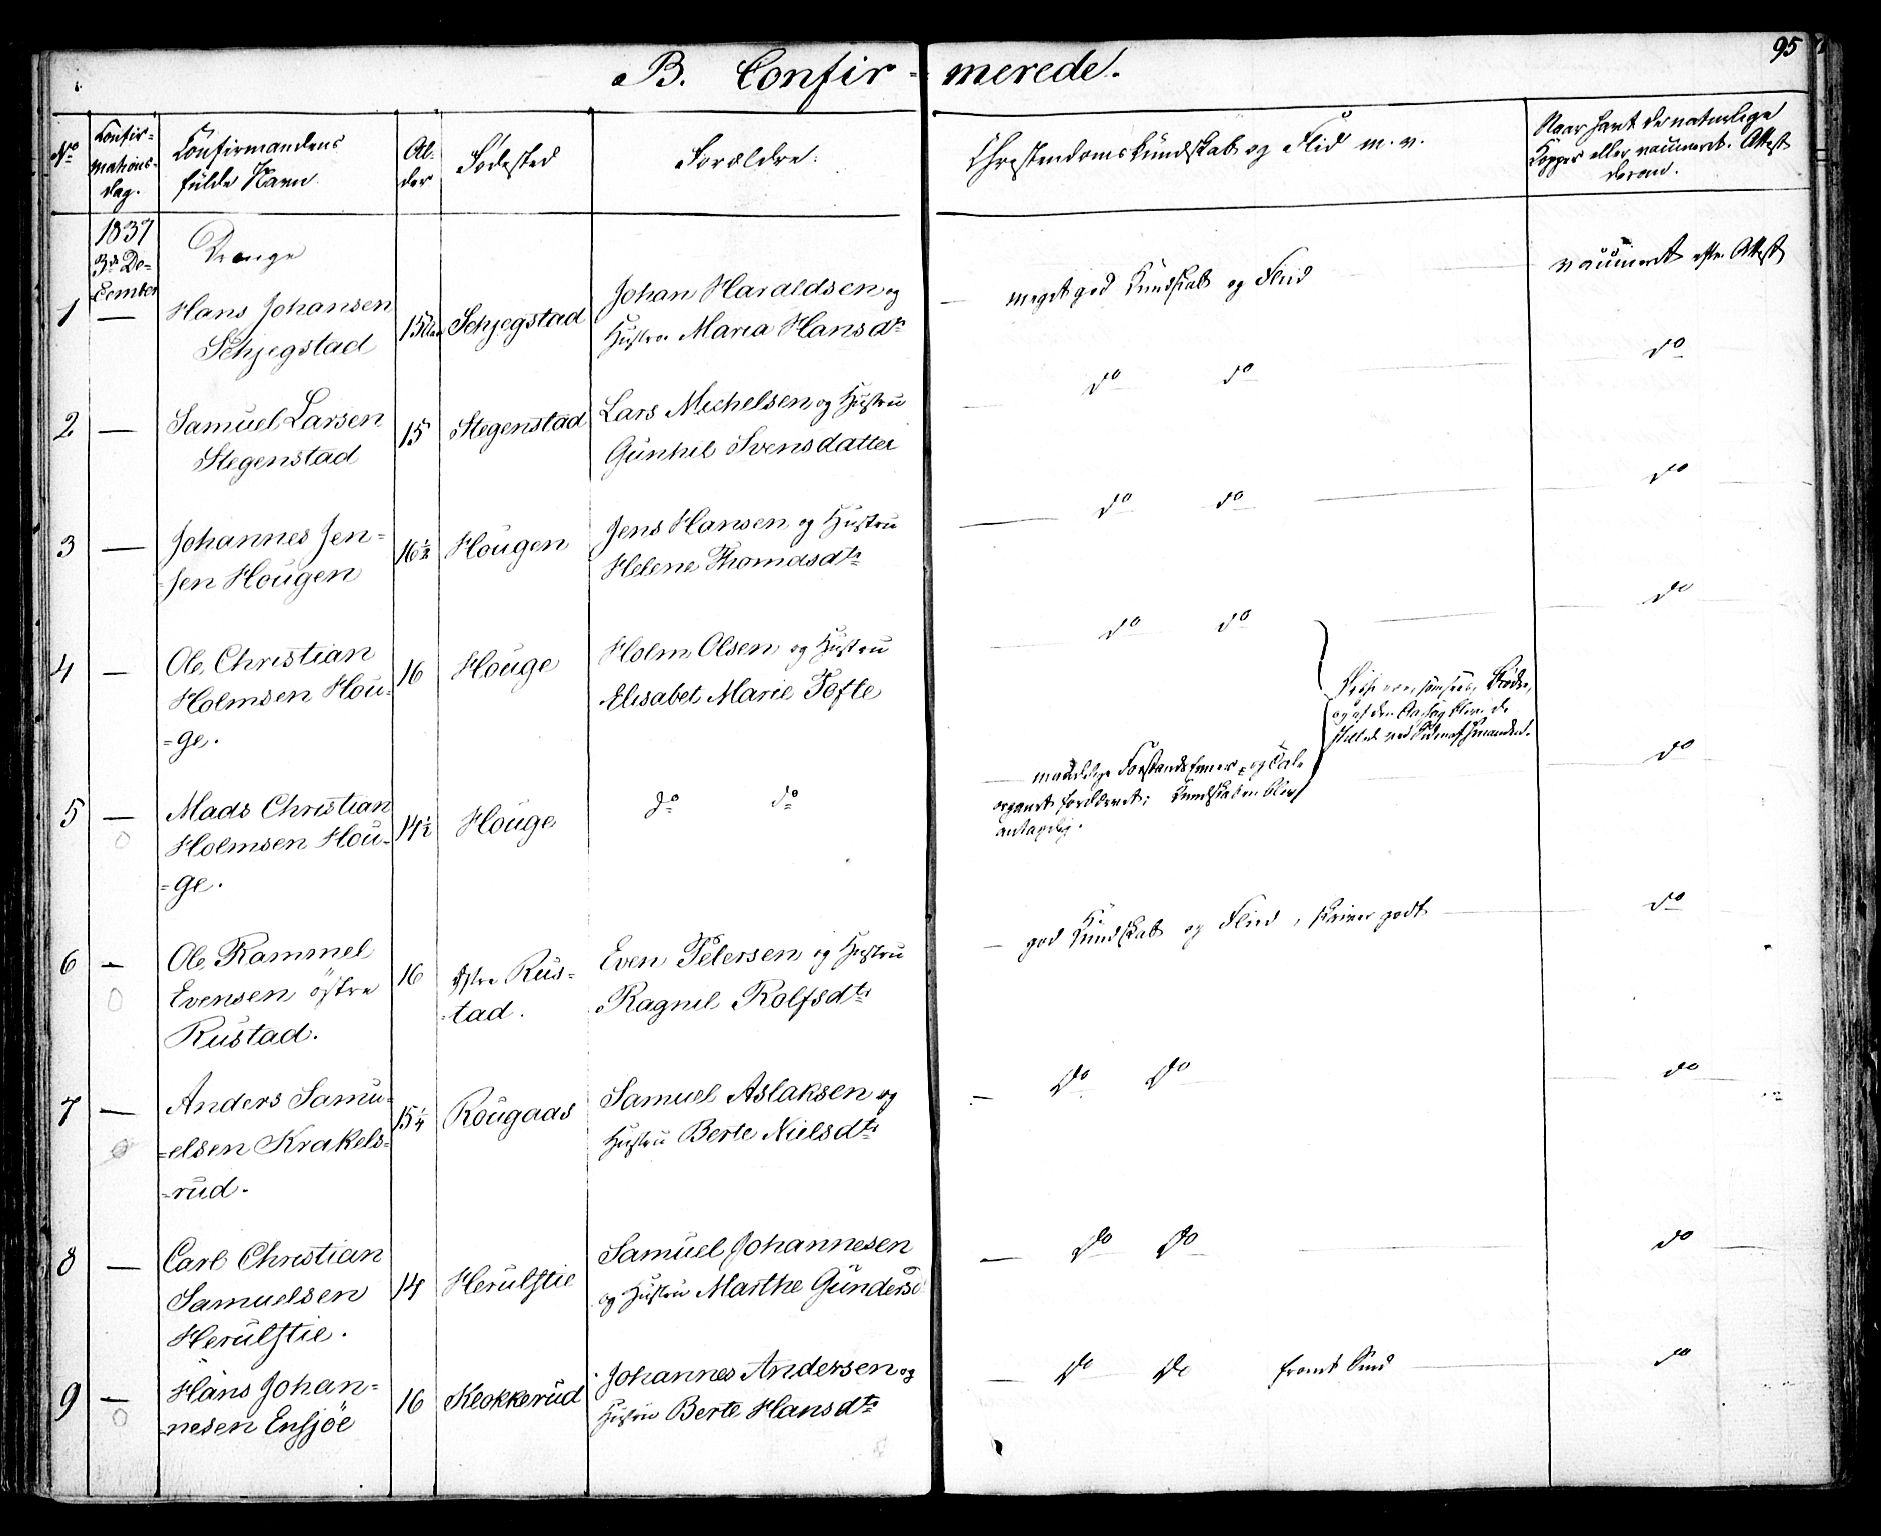 SAO, Kråkstad prestekontor Kirkebøker, F/Fa/L0005: Ministerialbok nr. I 5, 1837-1847, s. 95